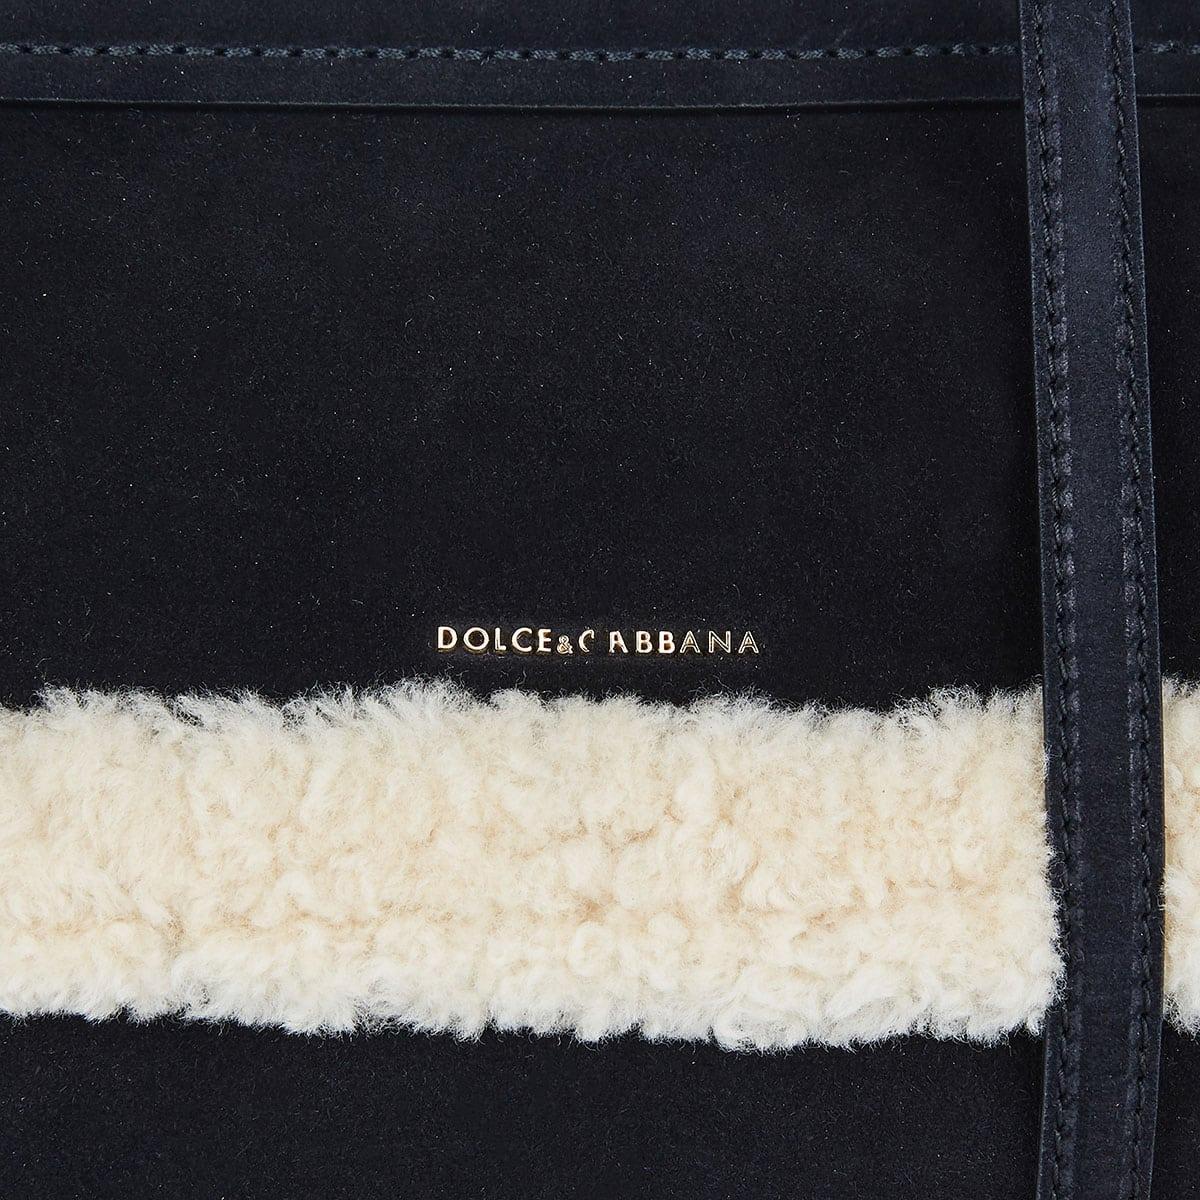 Sicily shearling-trimmed suede bag